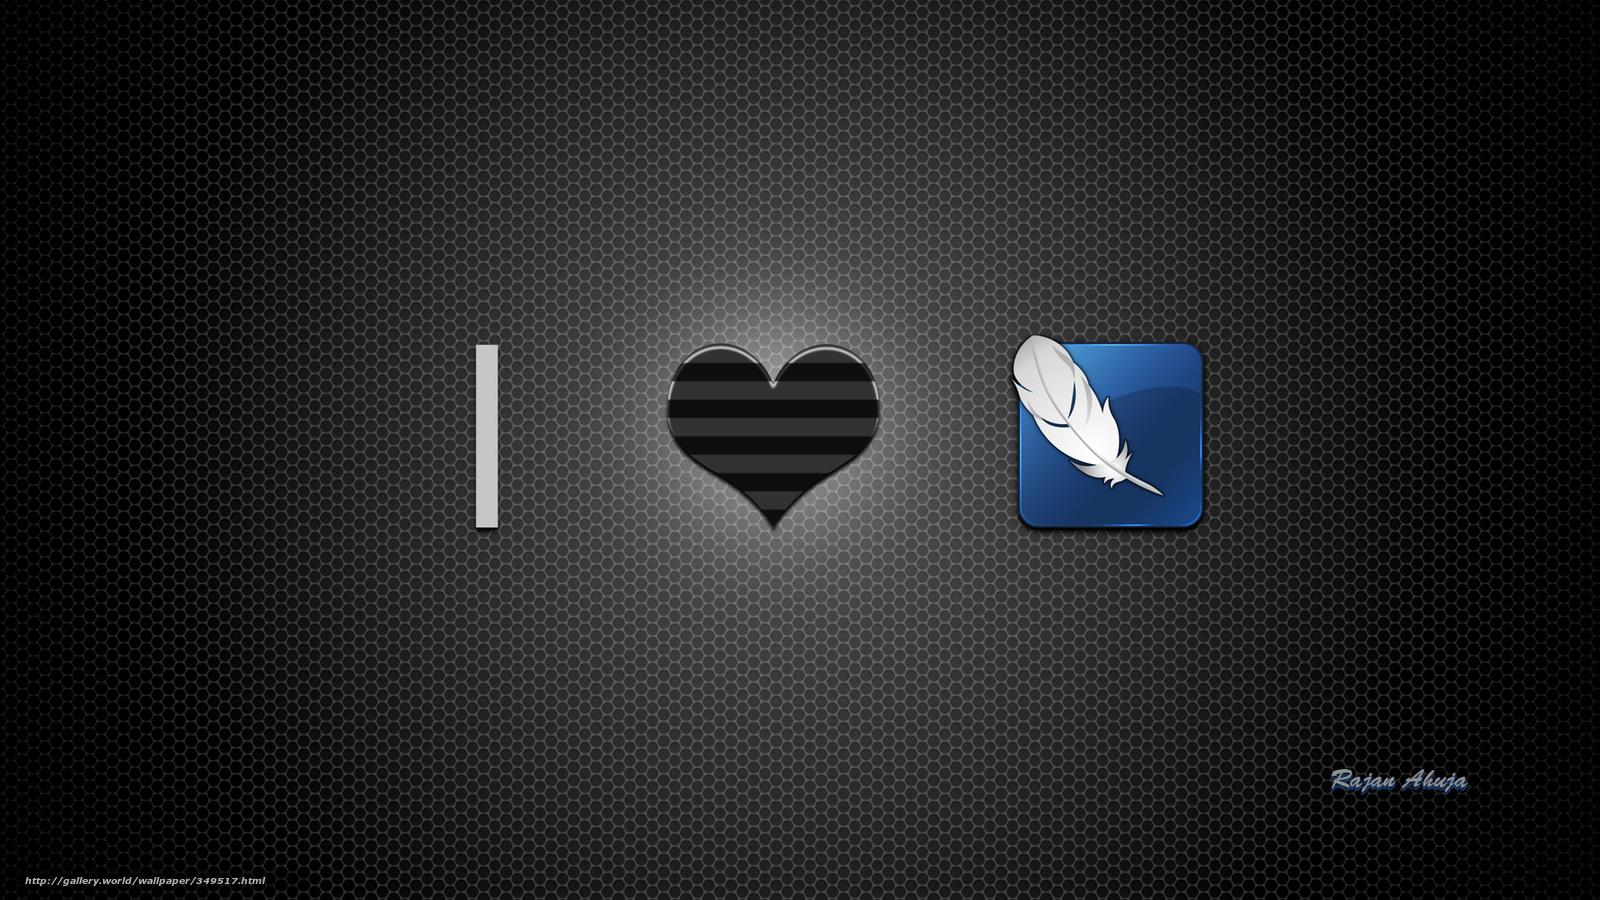 Download wallpaper photoshop heart wallpaper free - Wallpaper picture ...